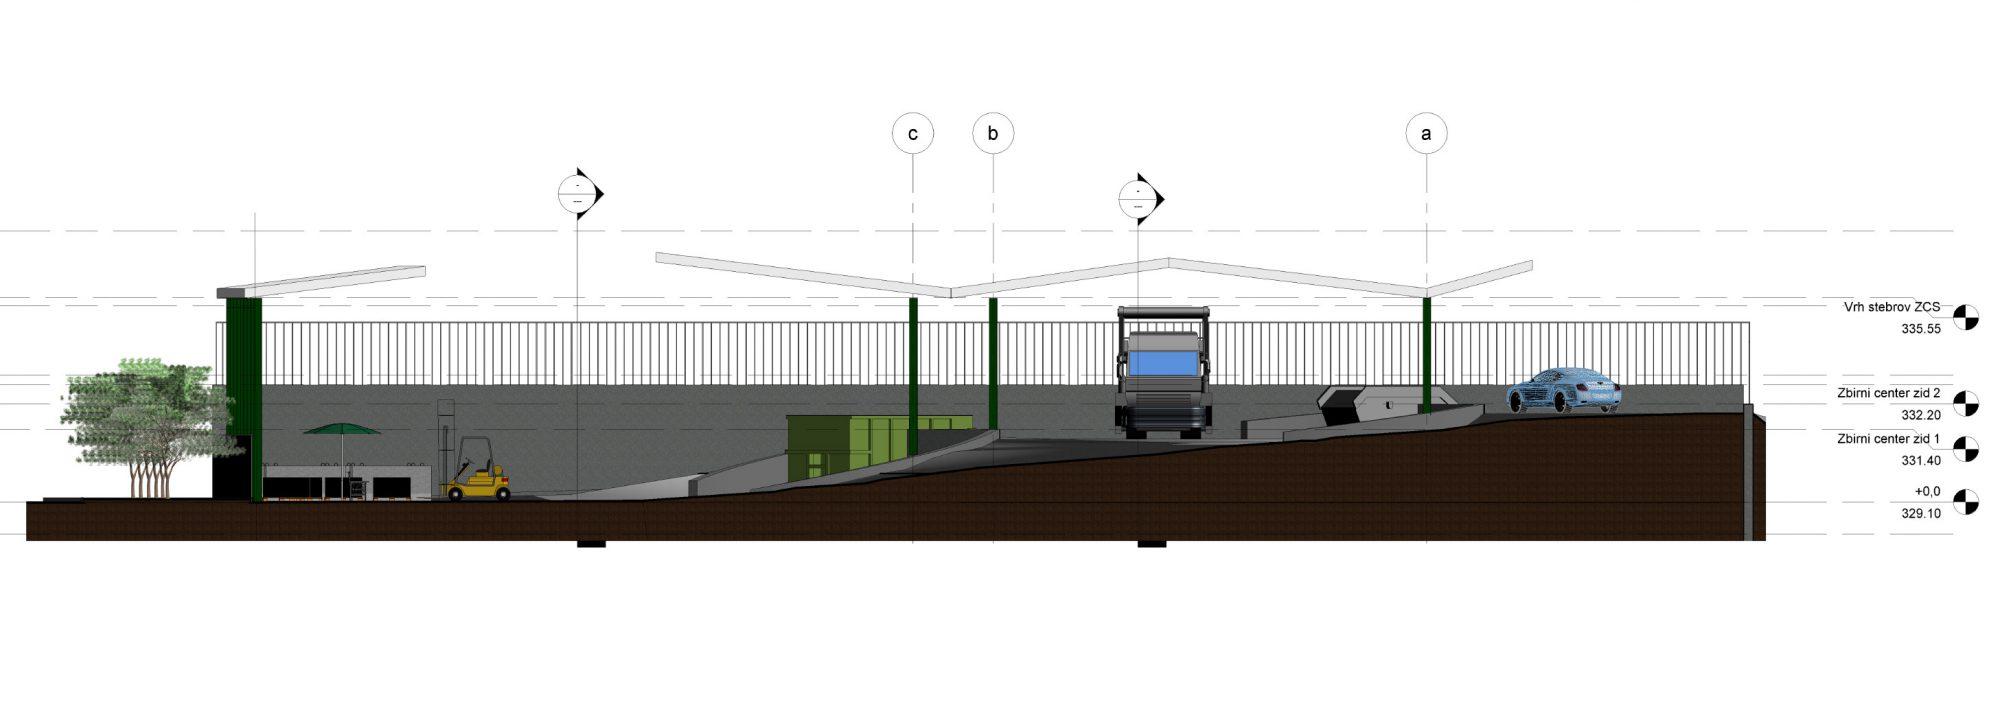 Zbirni center Suhadole